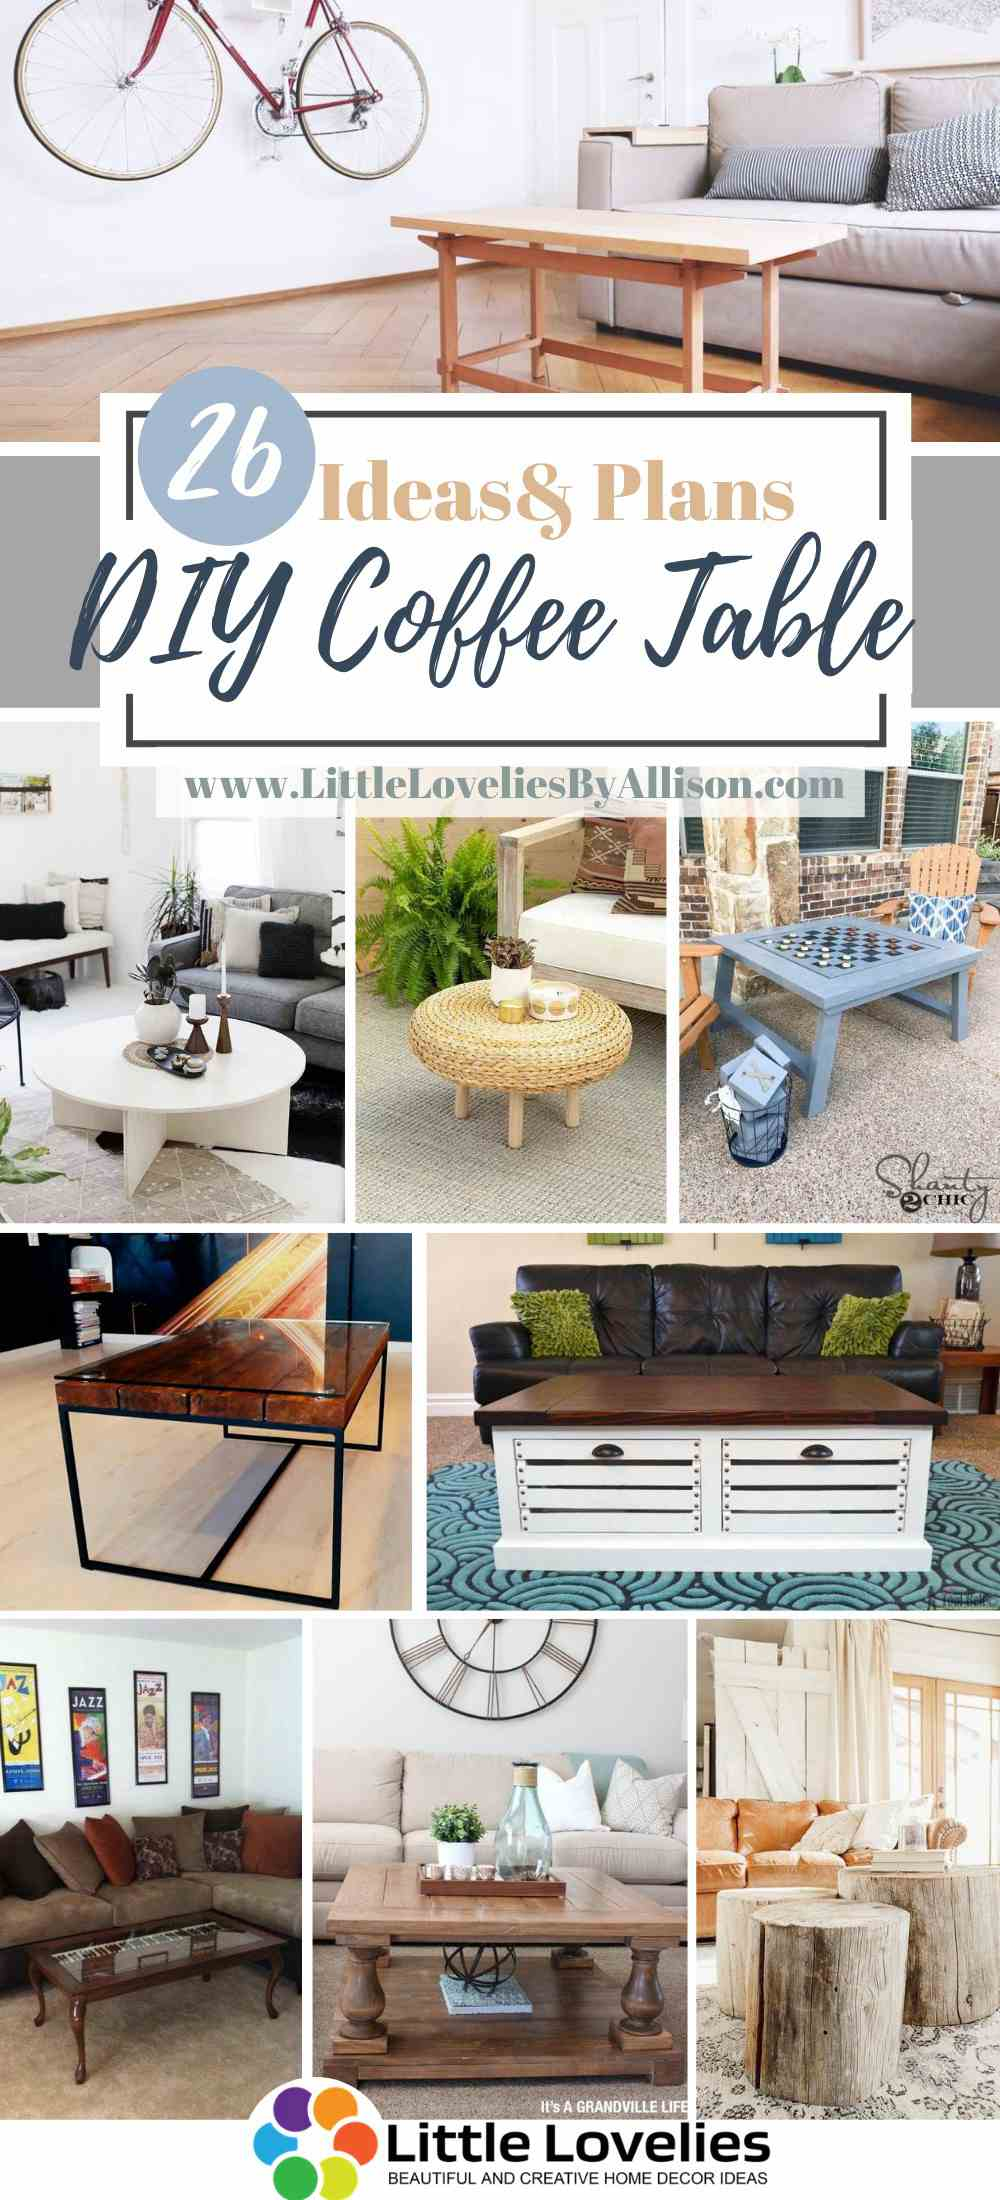 diy-coffee-table-ideas